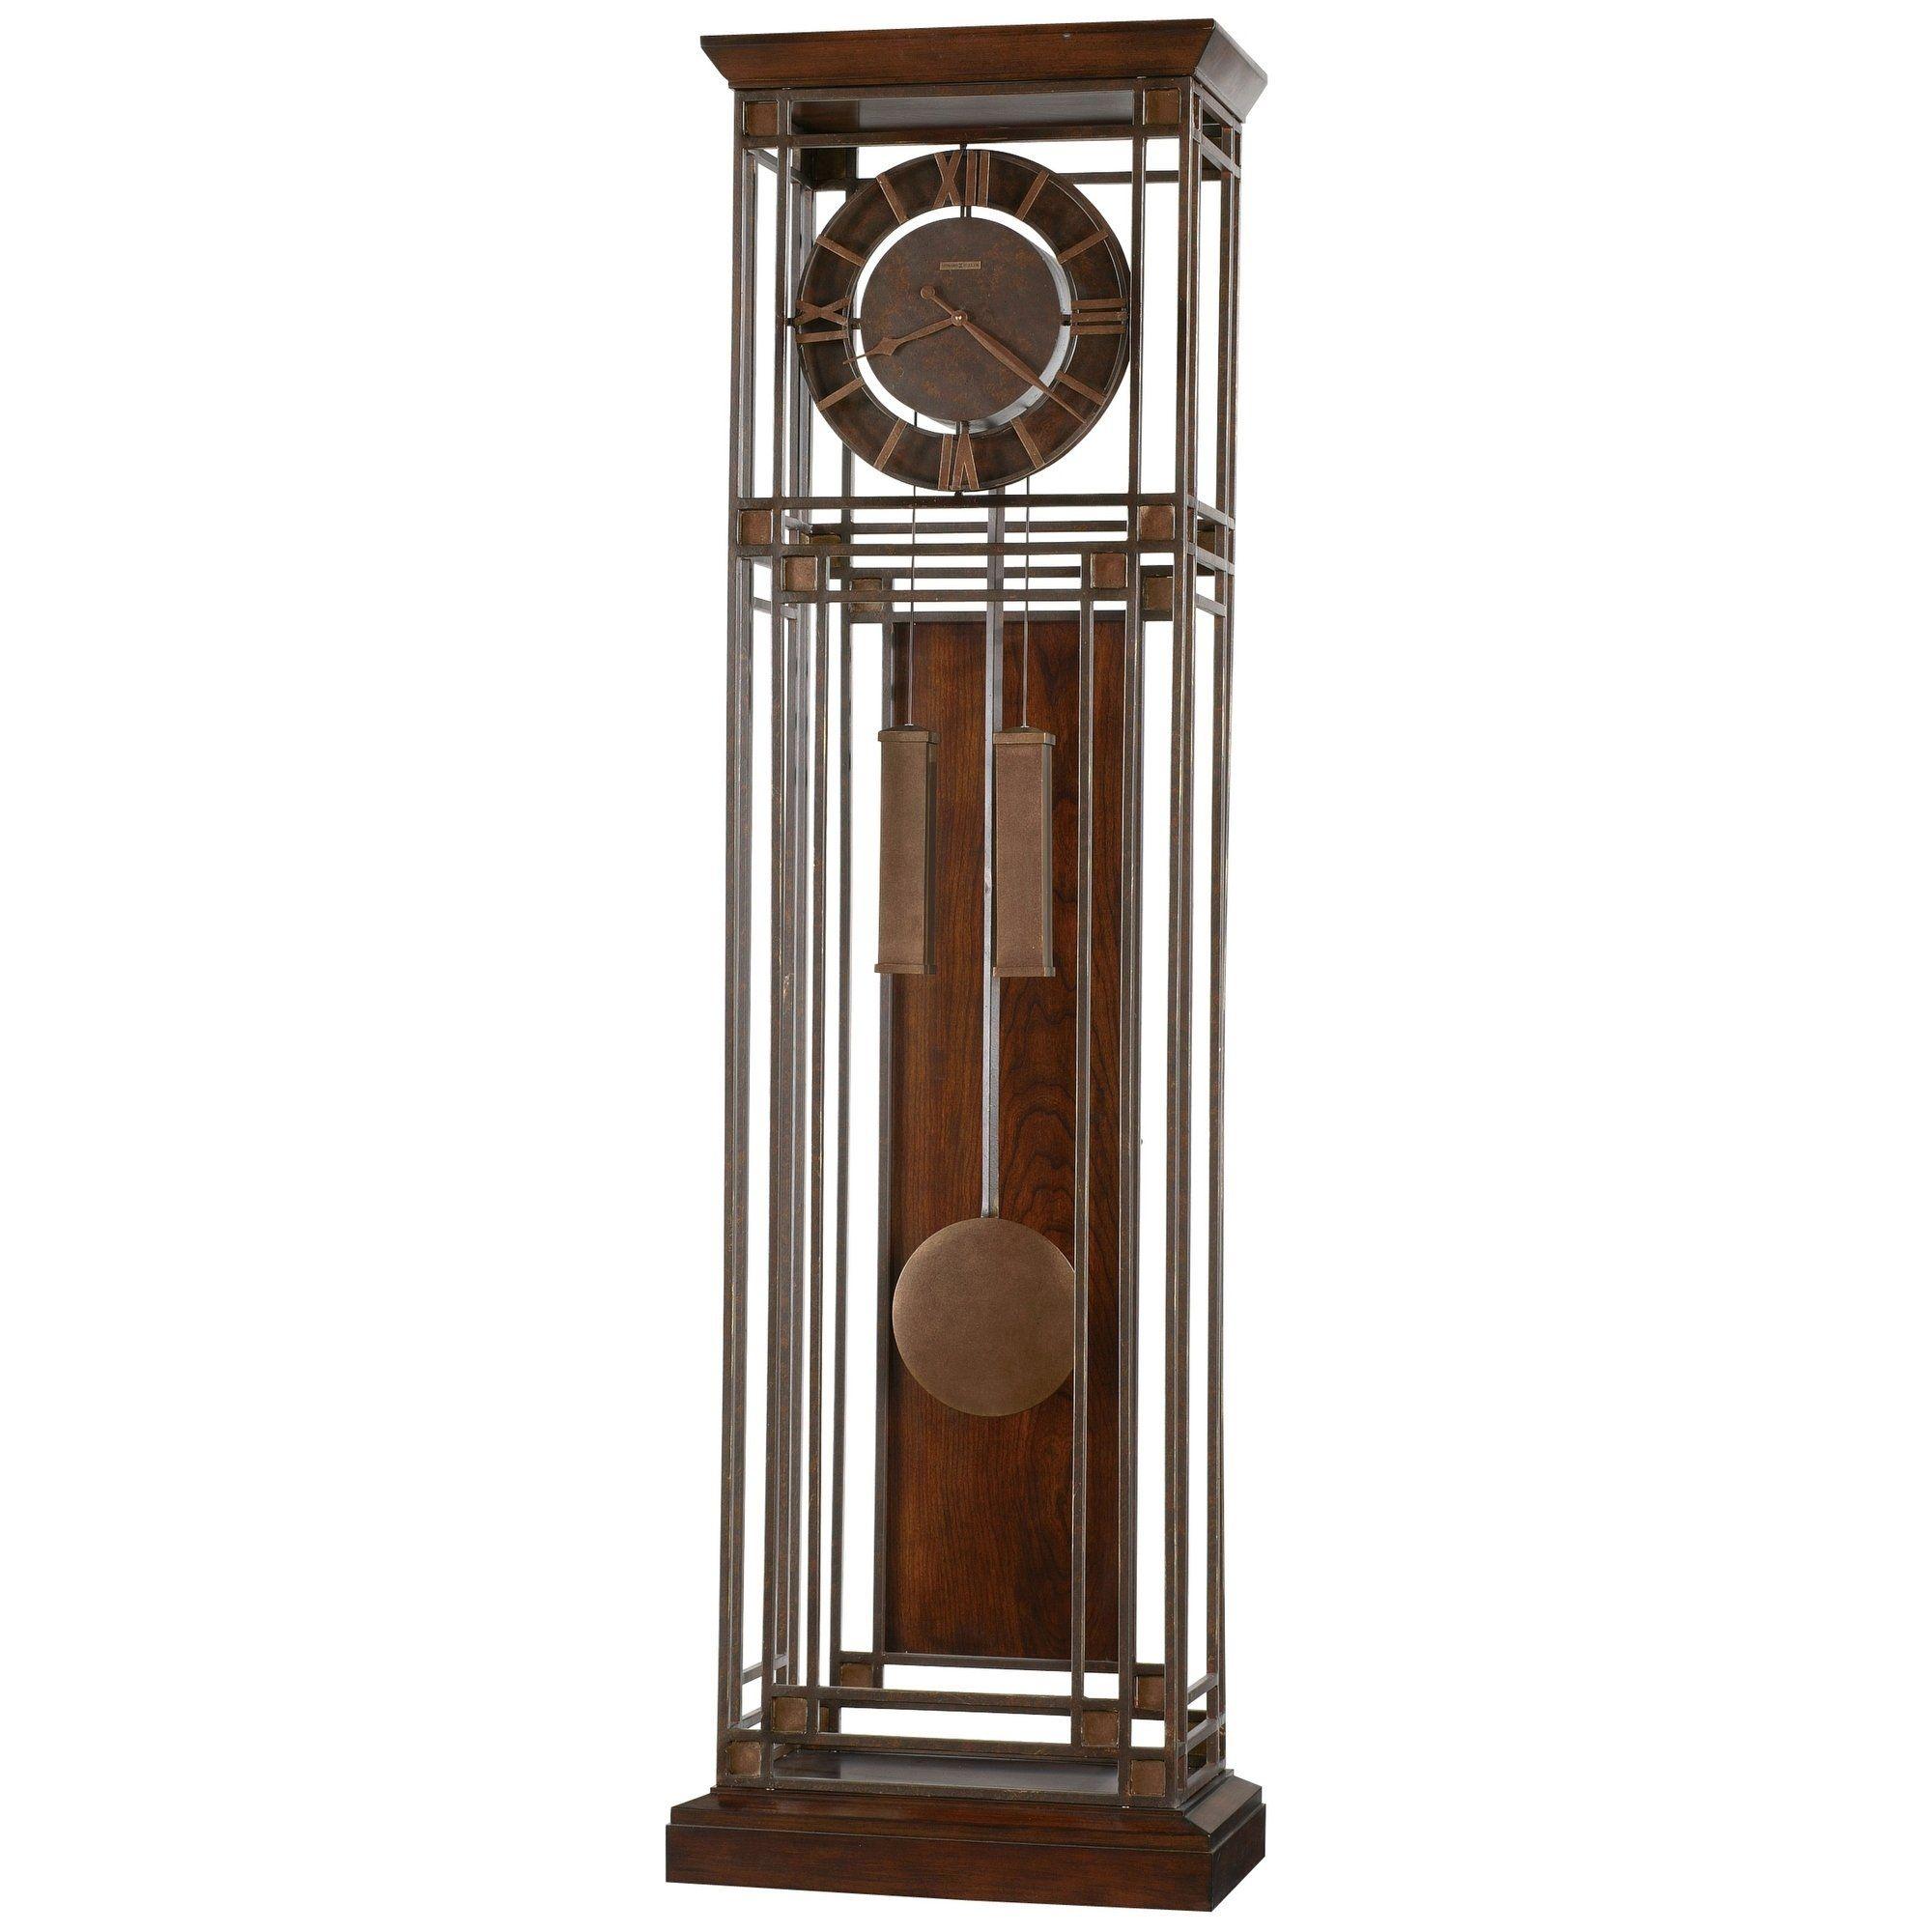 Howard Miller Tamarack Aged Ironstone Modern Grandfather Clock Style Standing Clock With Pendulum An Grandfather Clock Clock Modern Grandfather Clock